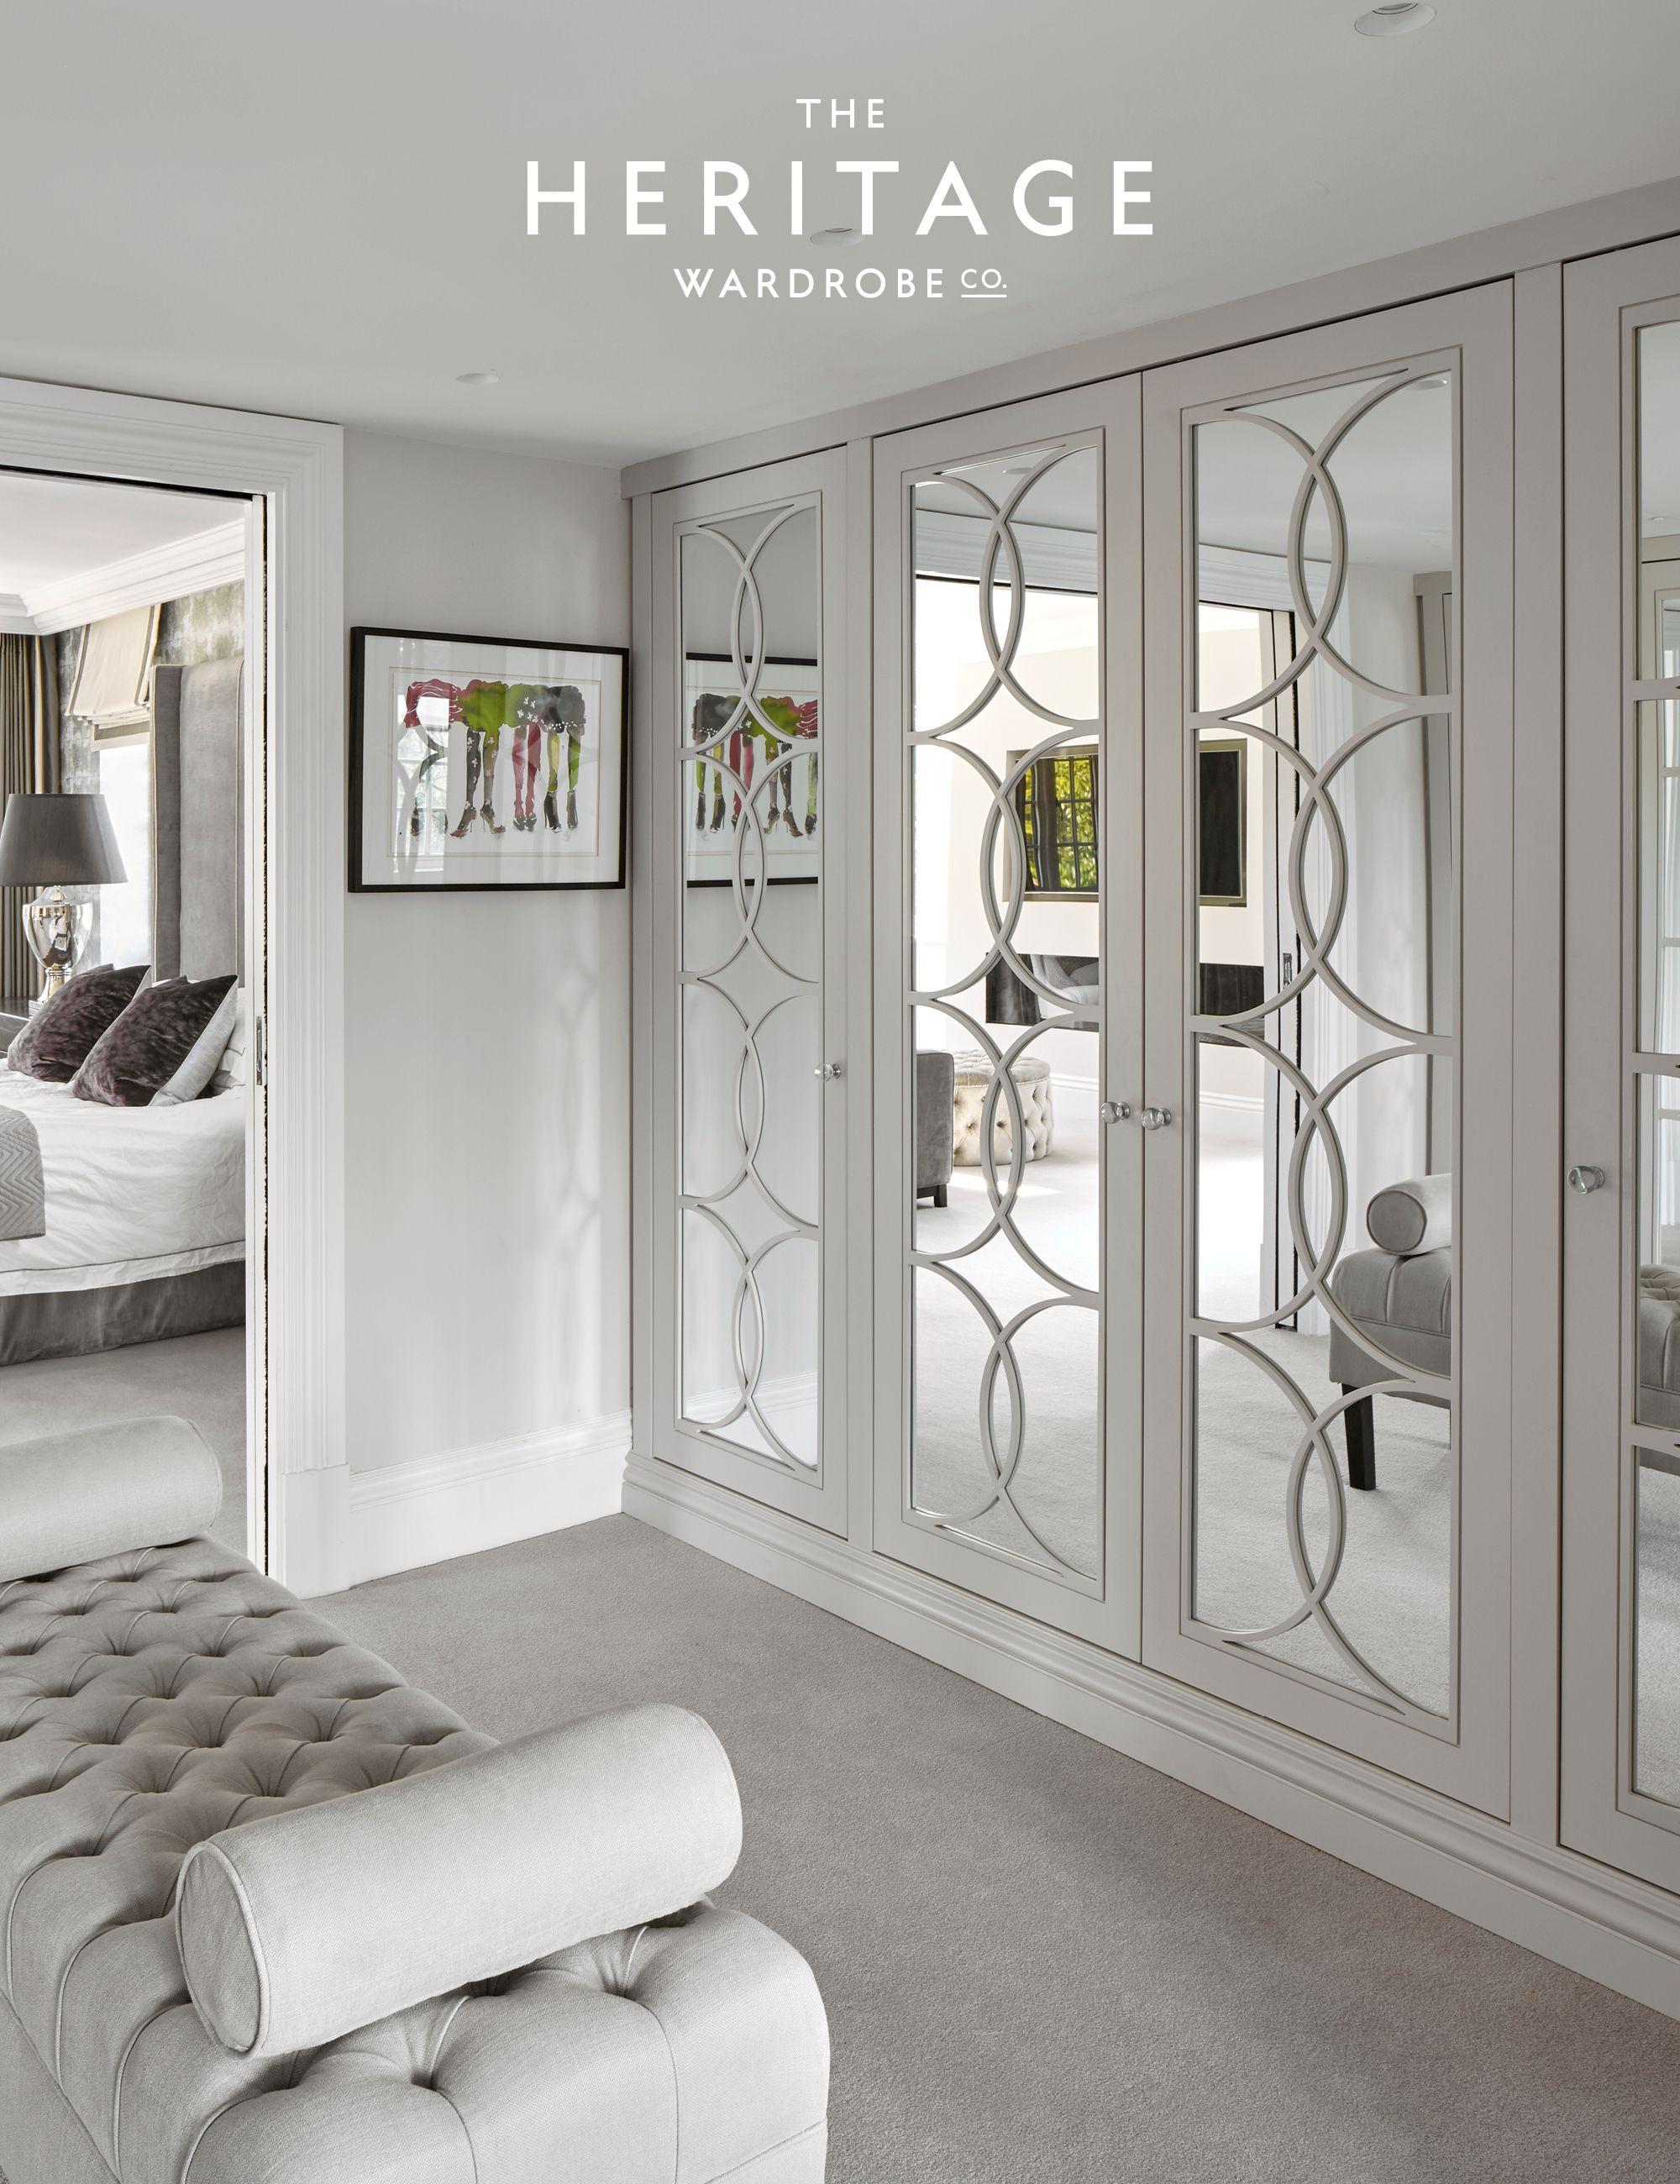 luxury bespoke wardrobes dressing rooms architecture. Black Bedroom Furniture Sets. Home Design Ideas